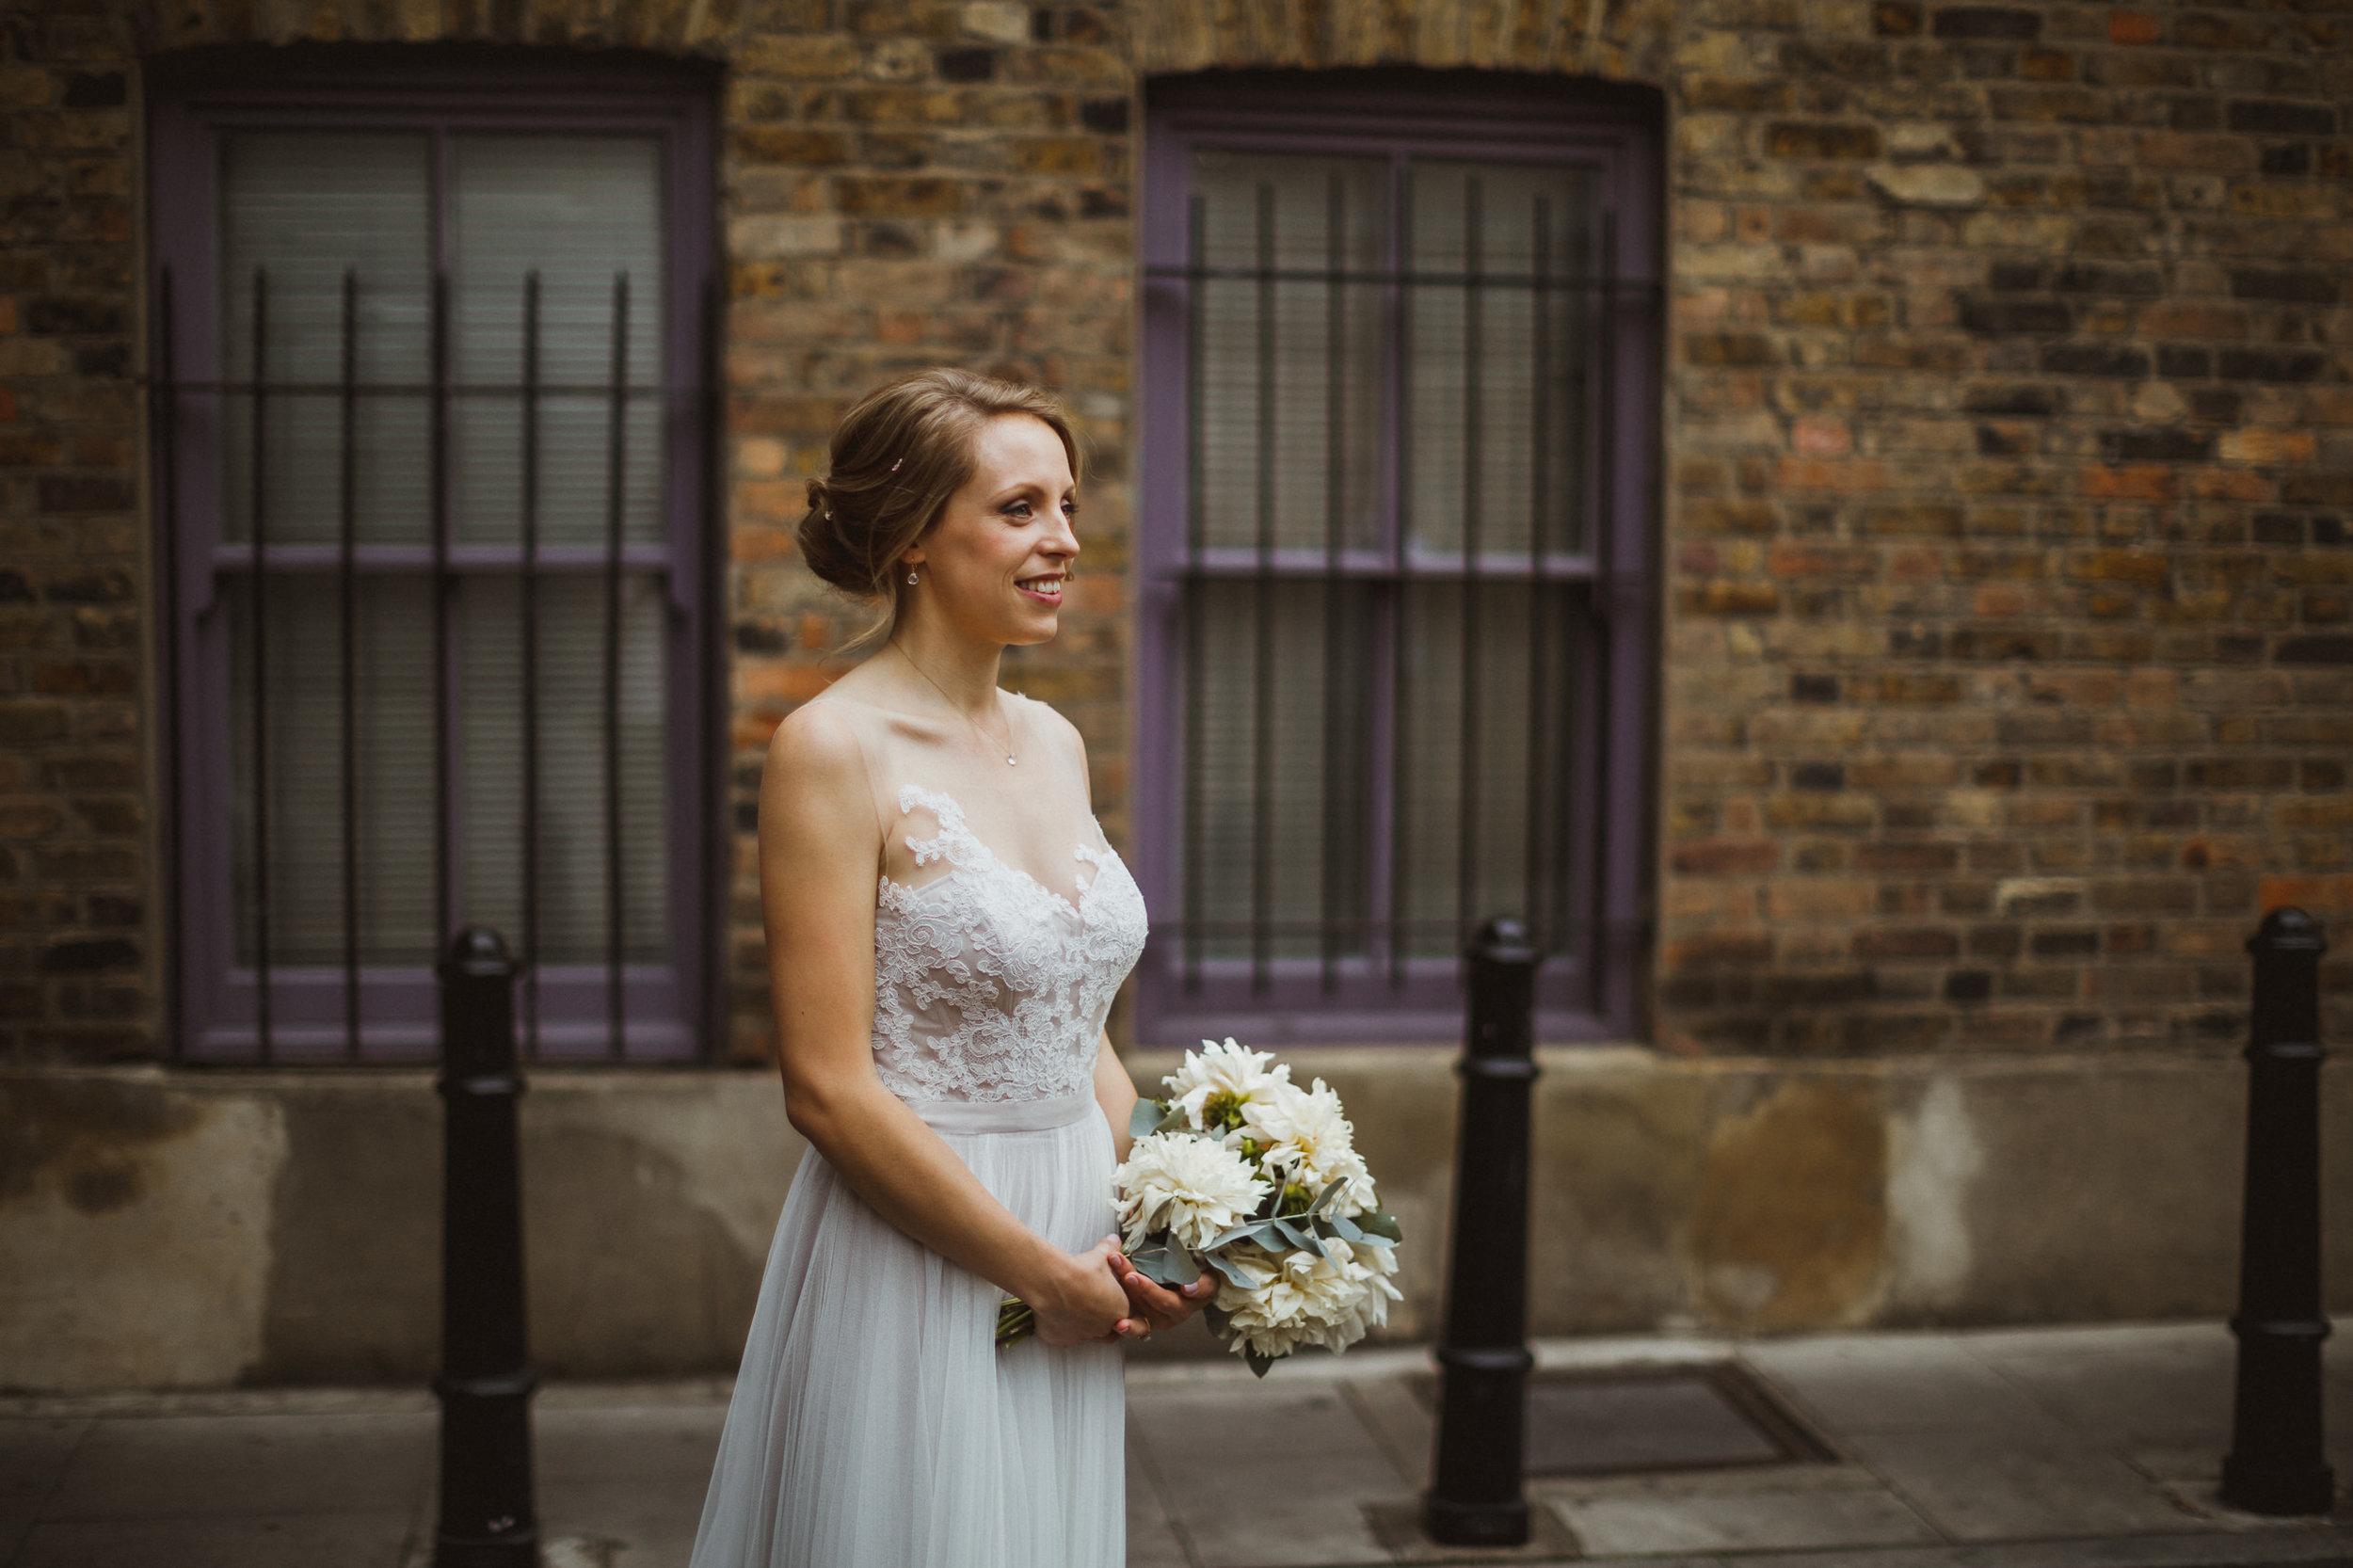 London-wedding-photographer-gione-da-silva-alex_paul-169.jpg